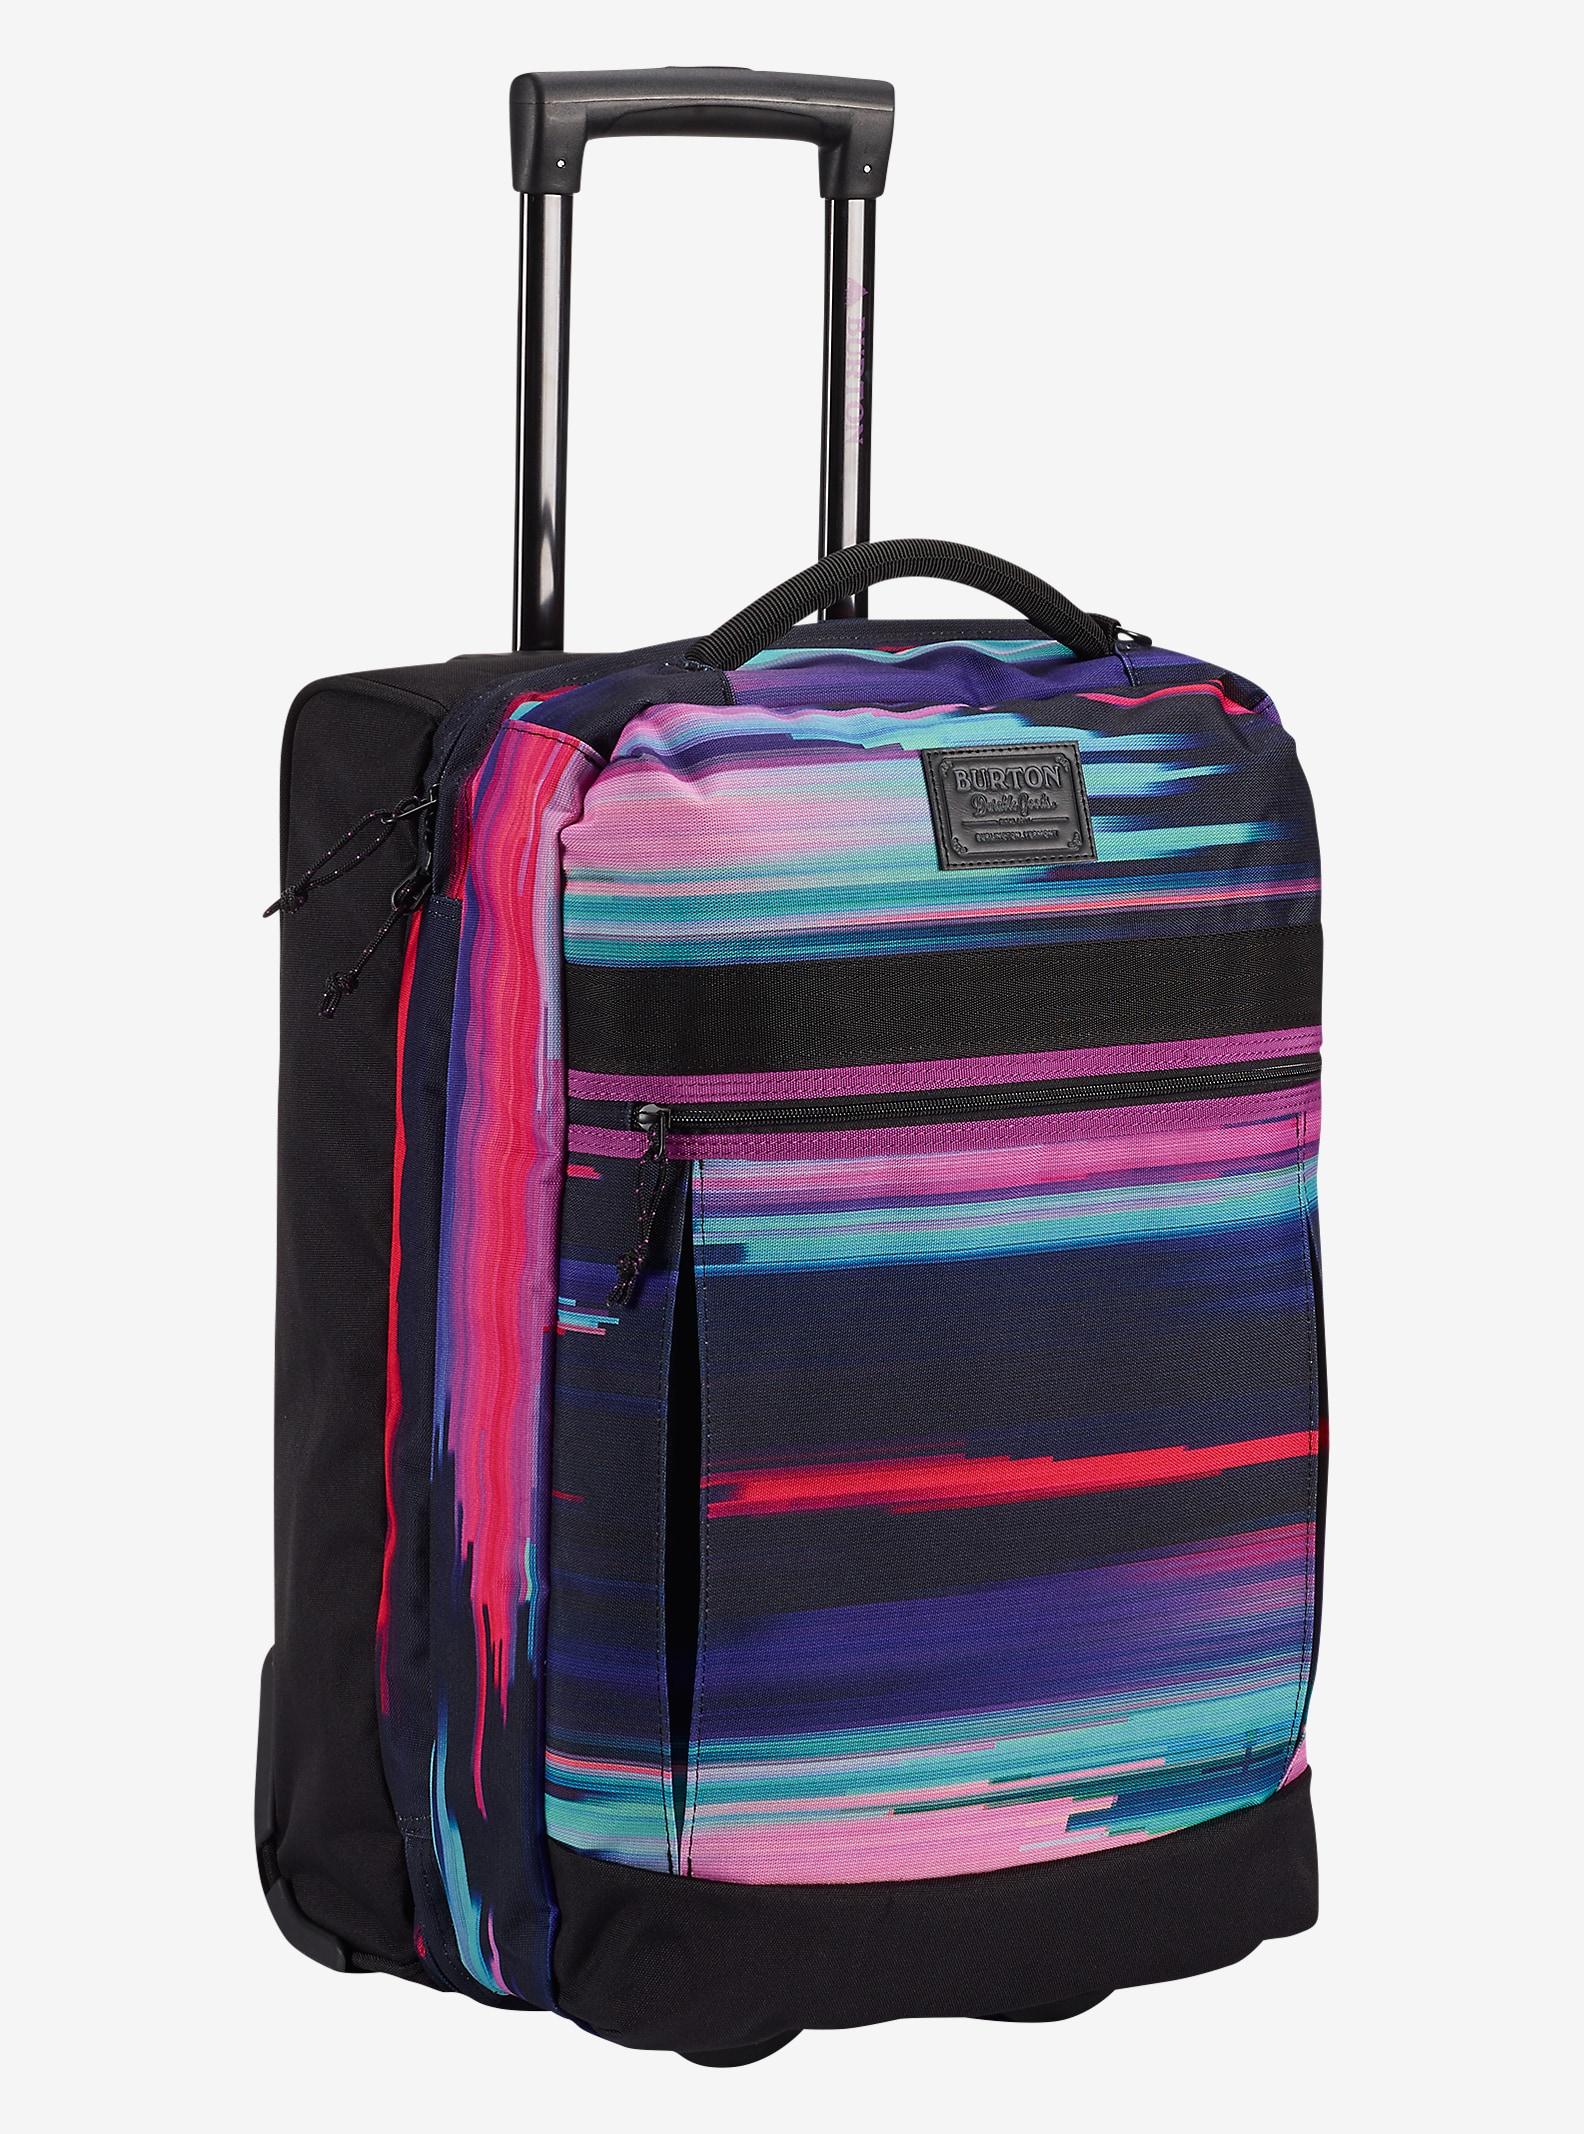 Burton Overnighter Roller Travel Bag shown in Glitch Print